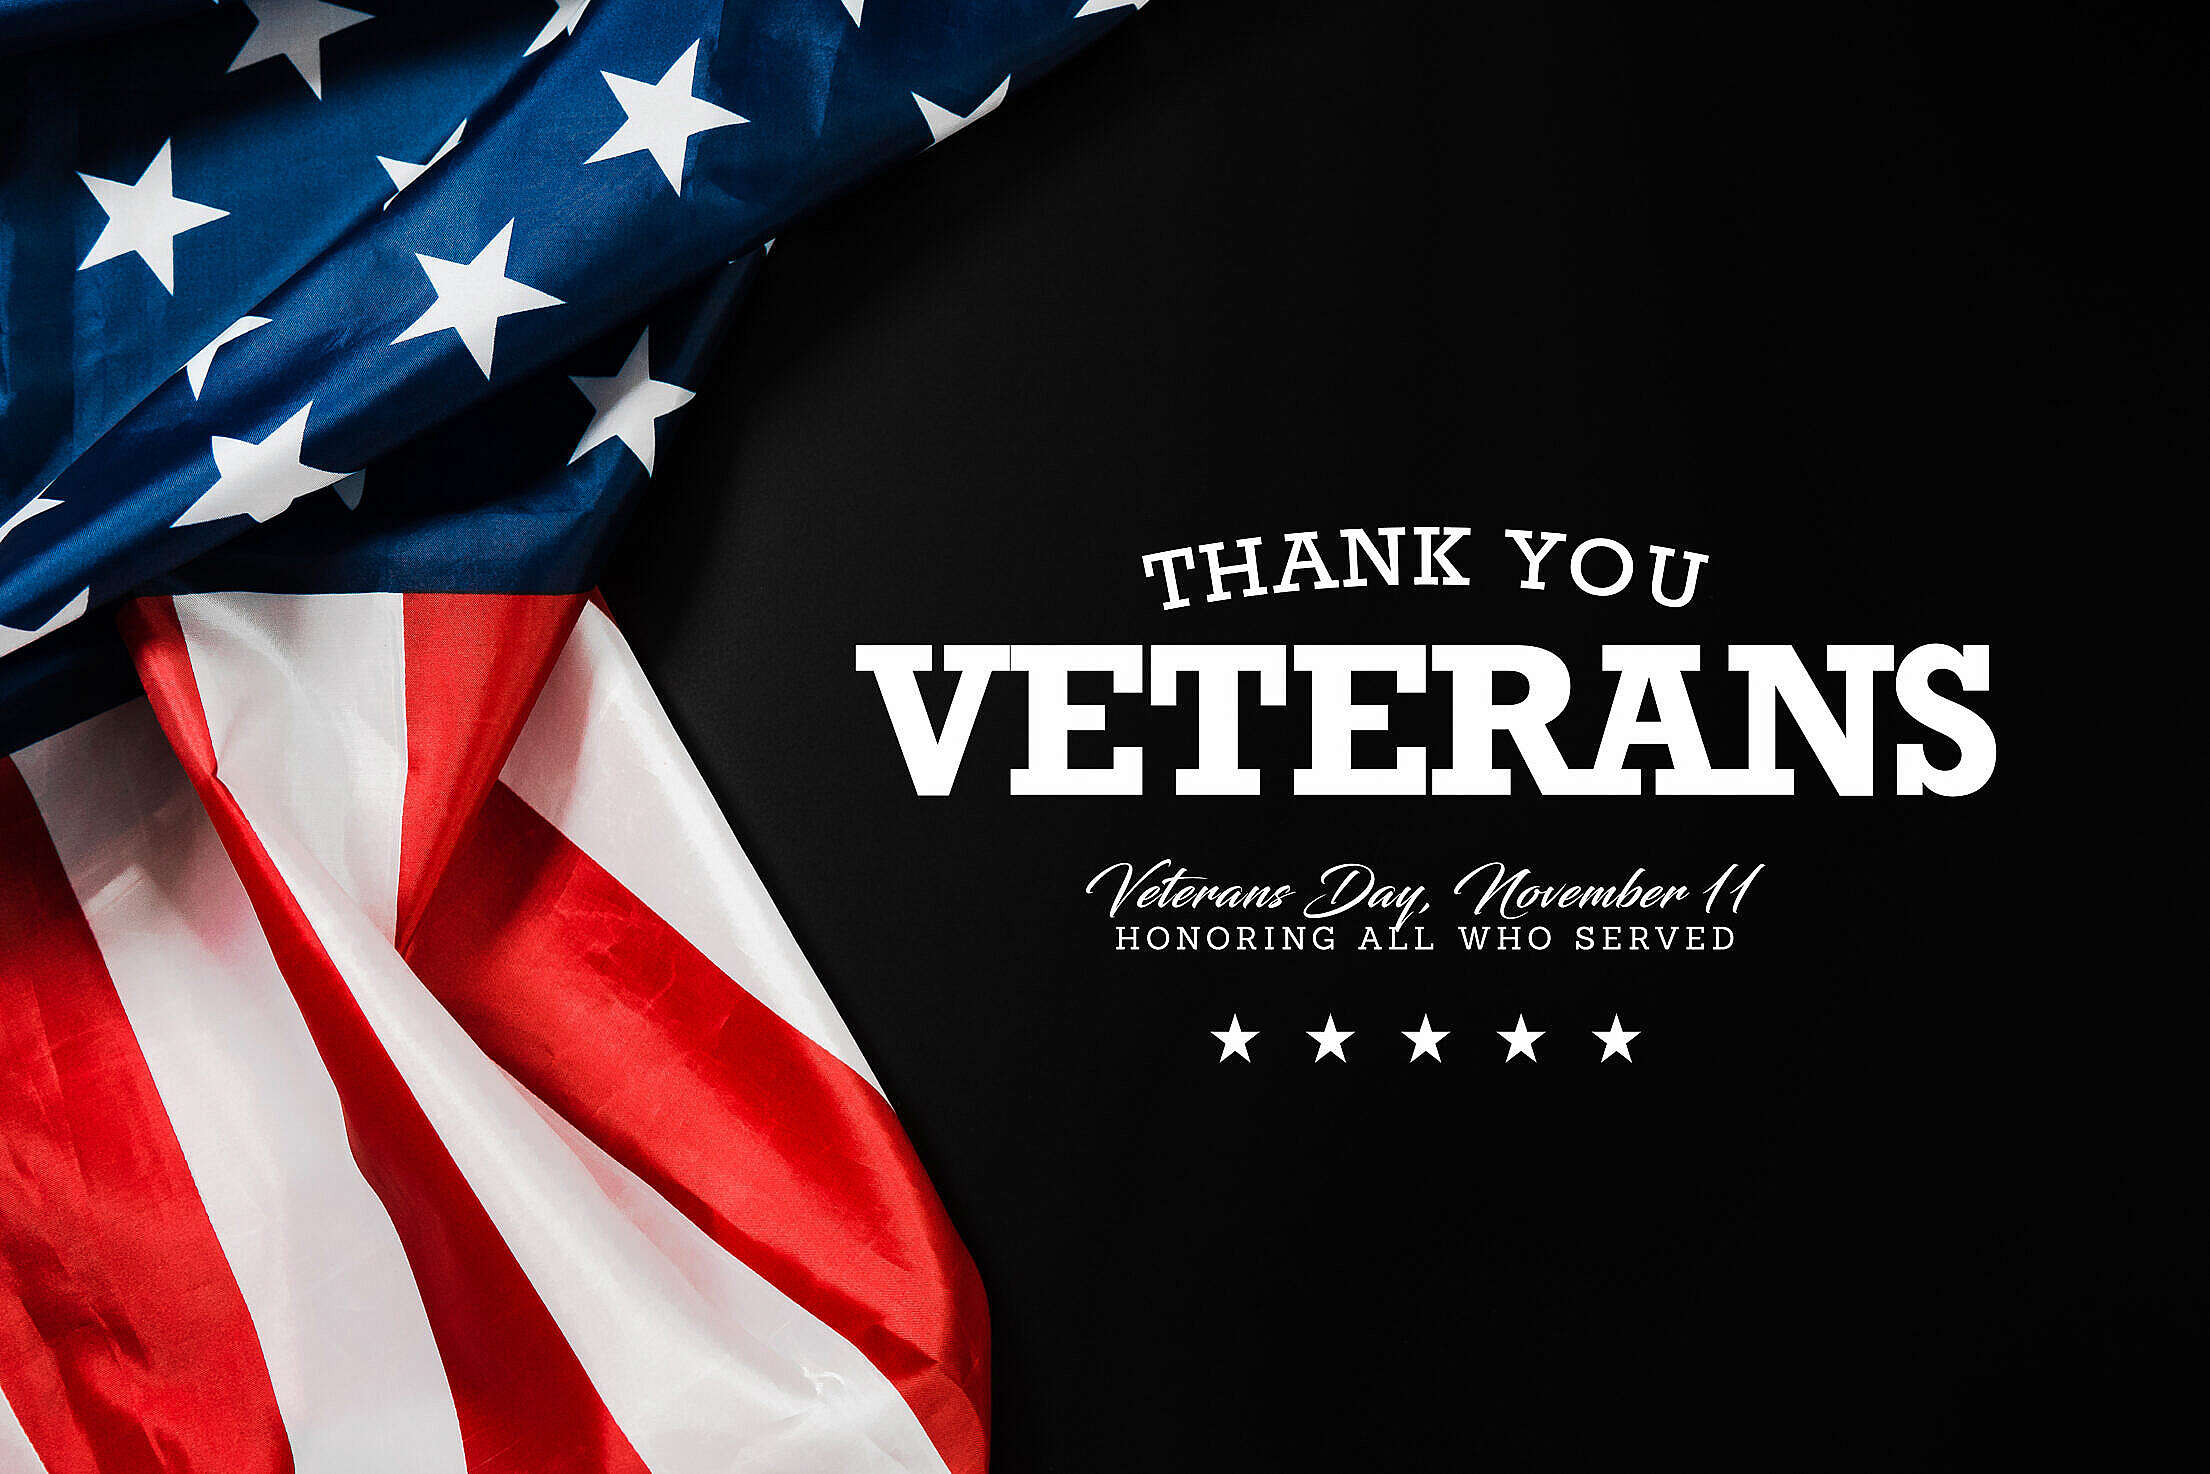 Thank You Veterans Free Stock Photo